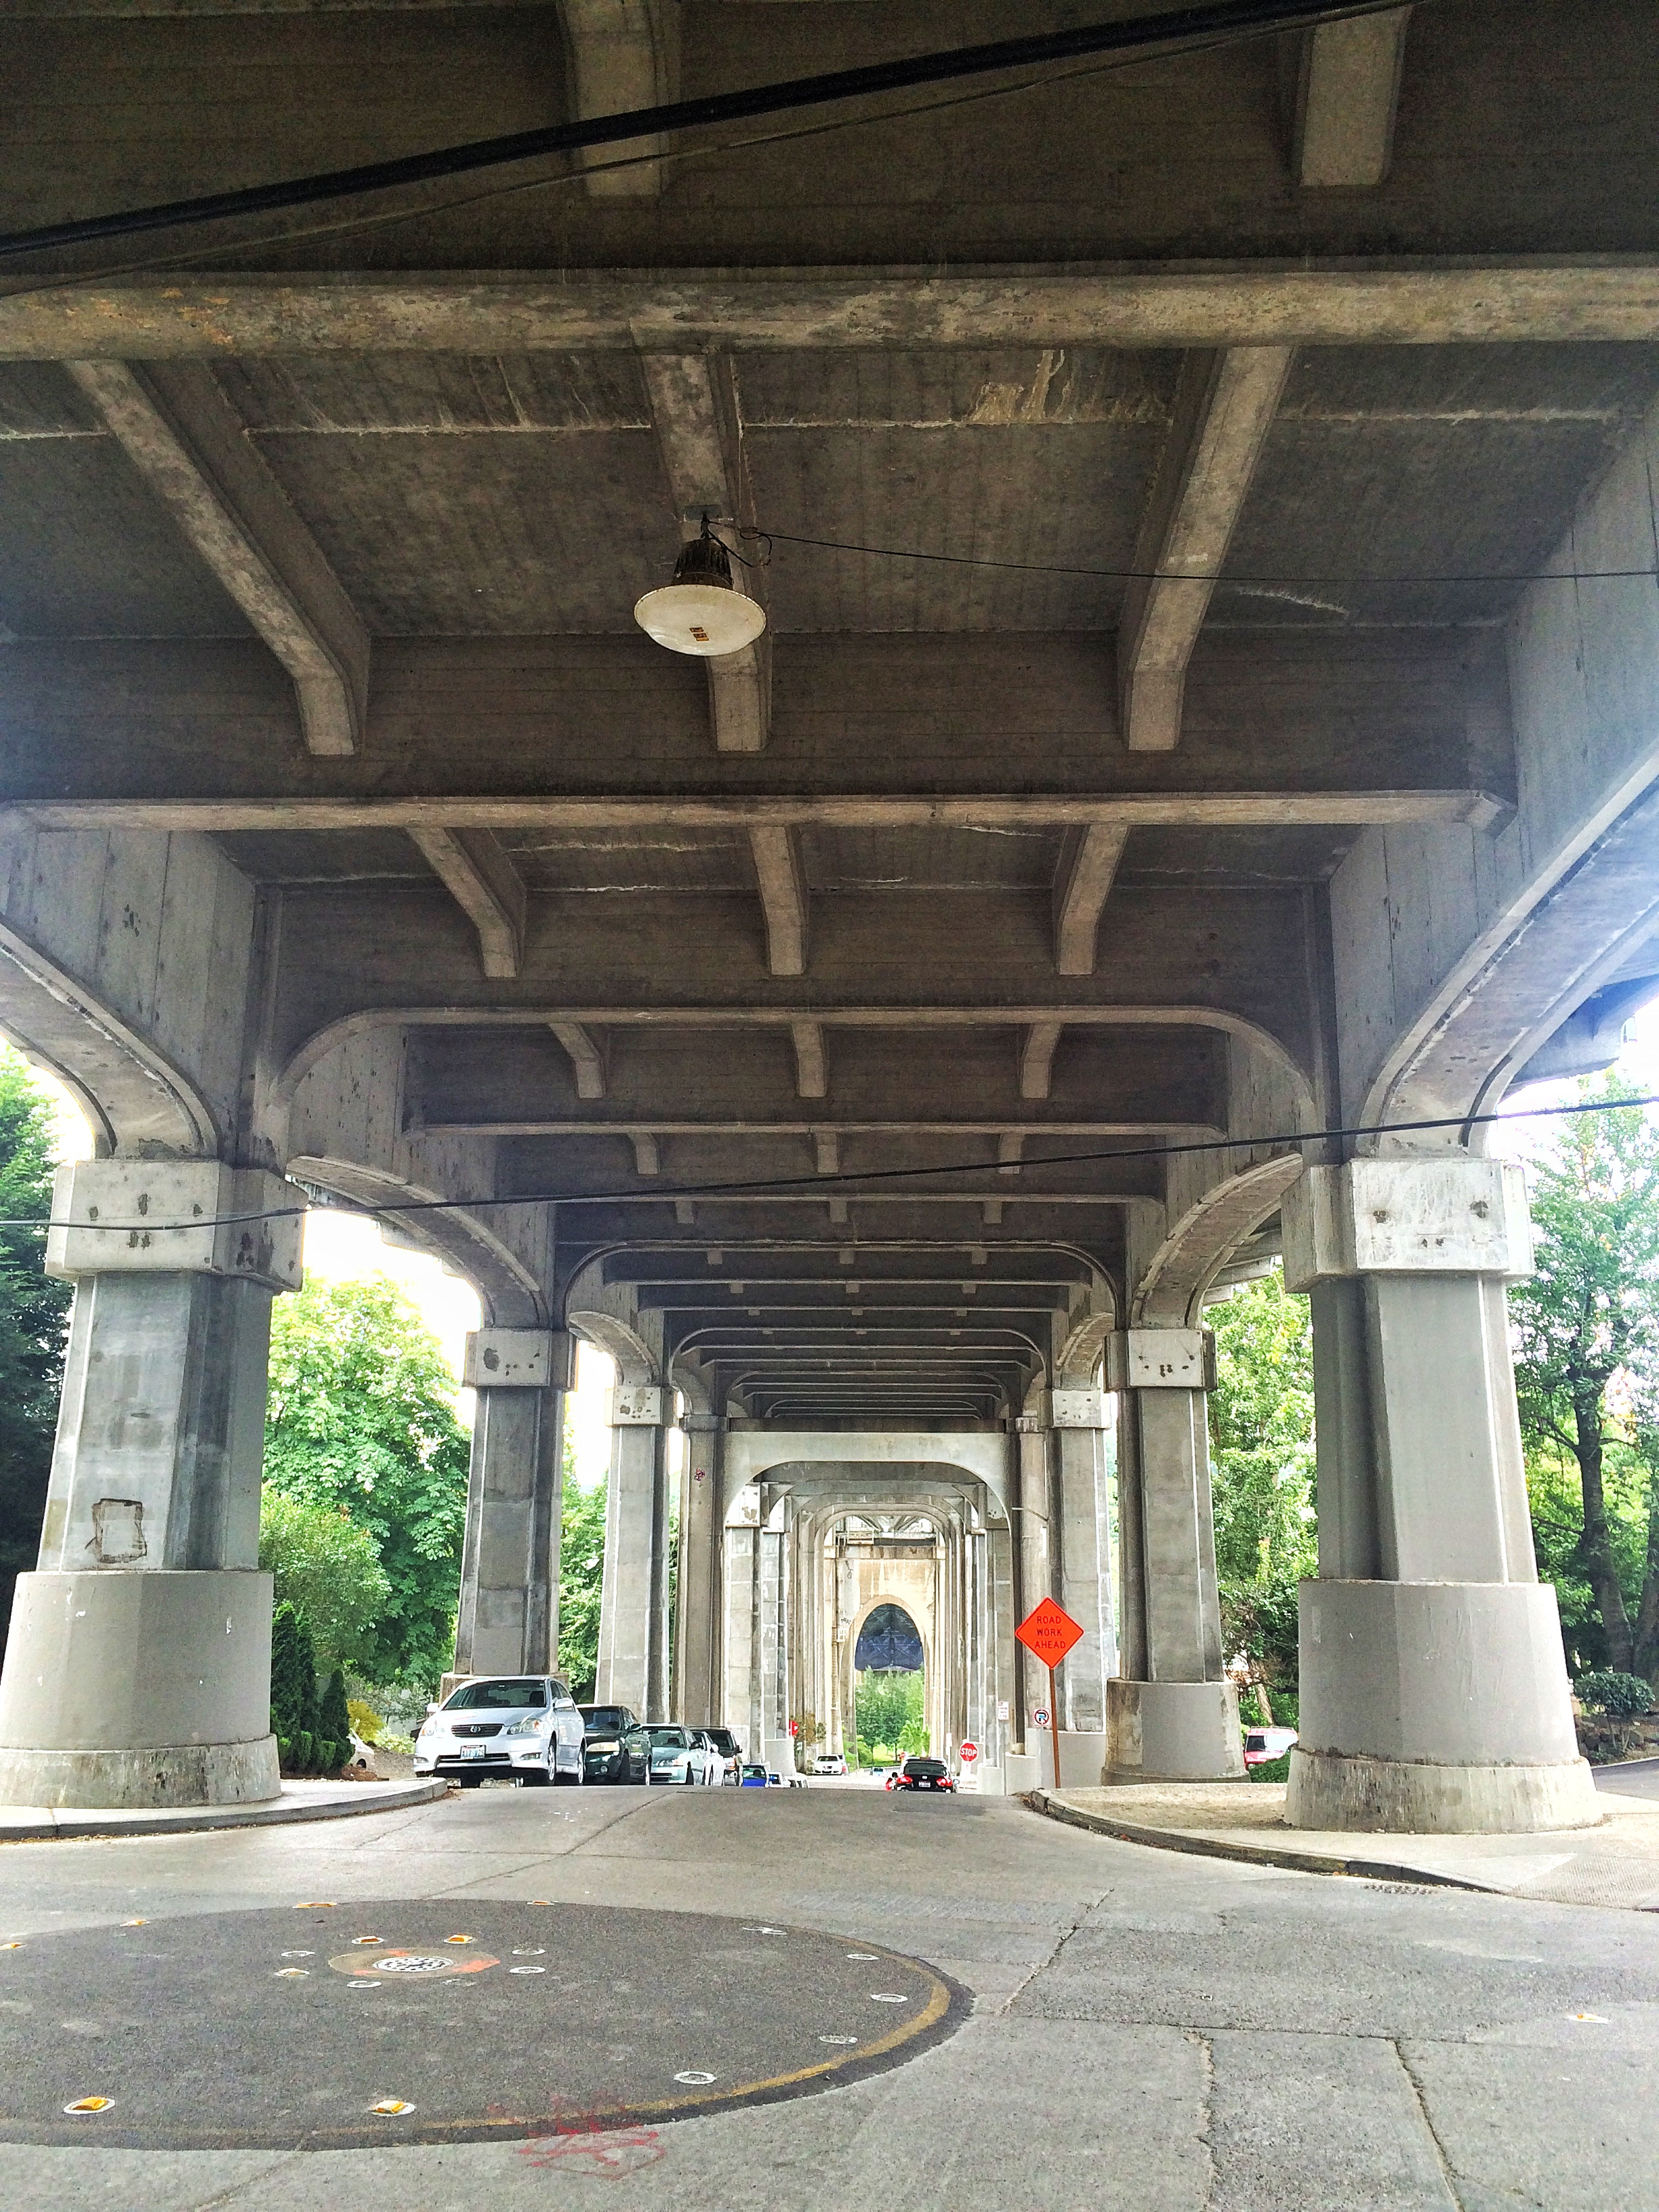 Troll Avenue, looking up at the Aurora Bridge